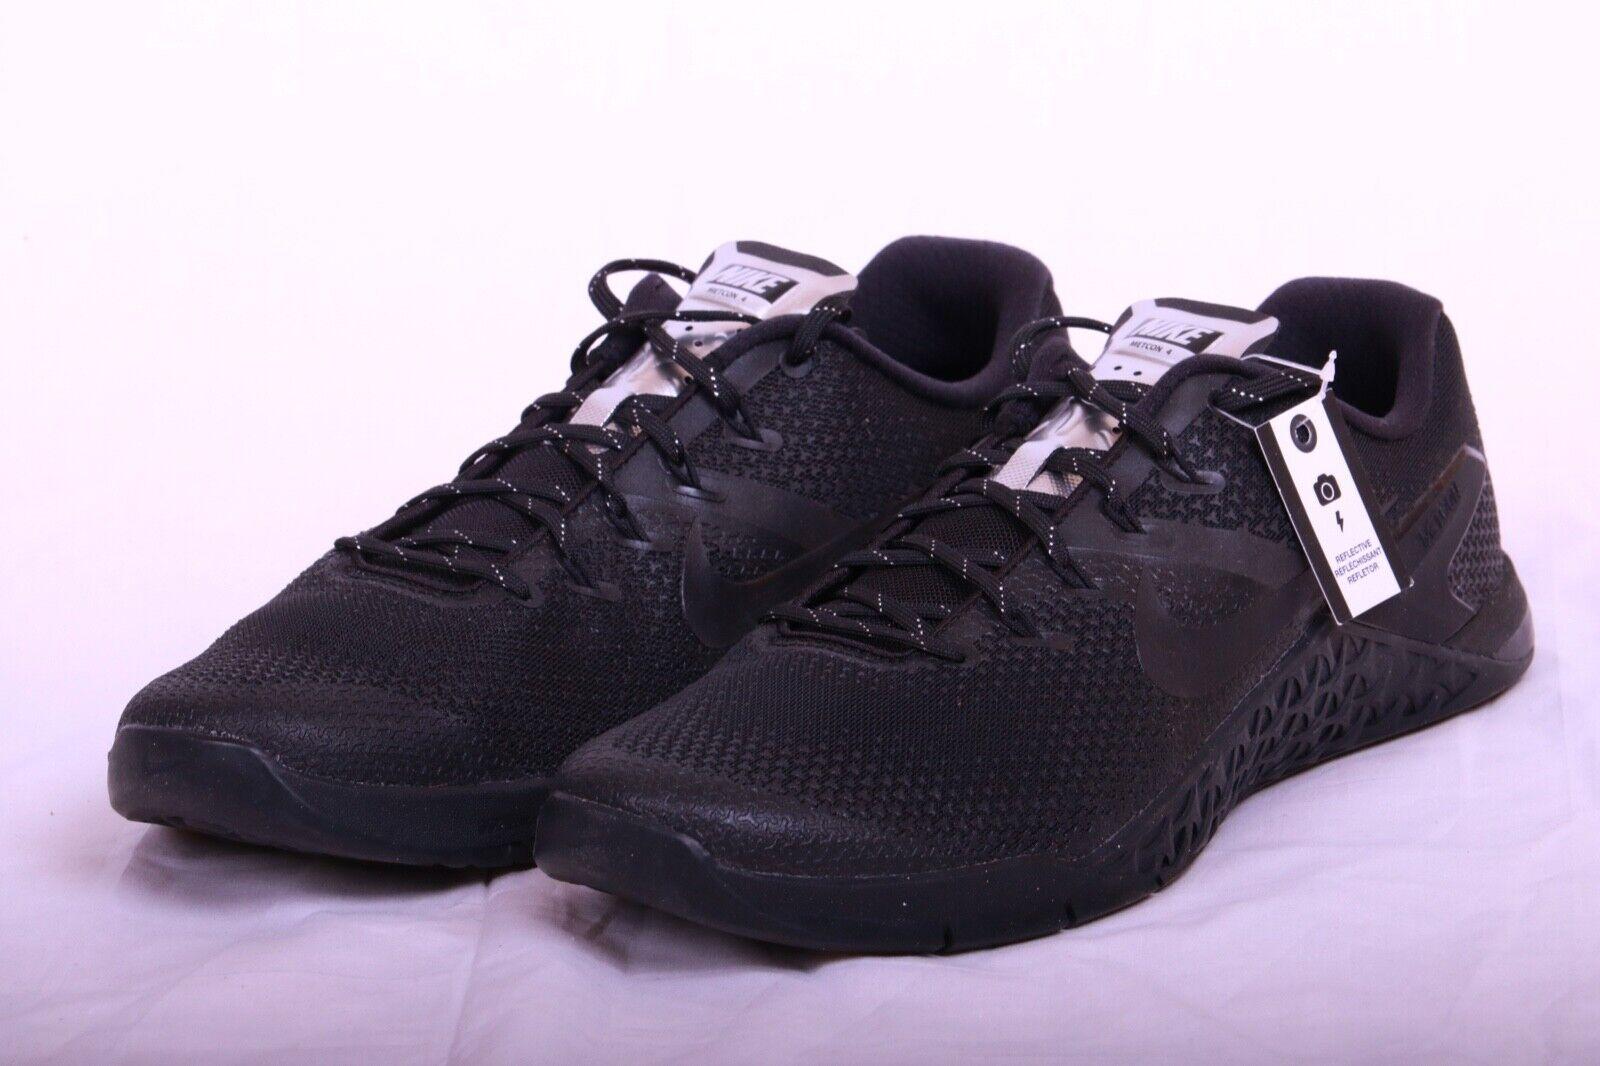 096a408beb510 Nike Metcon 4 Selfie Women s Training Shoes Size 14 Ah8194 001 for ...